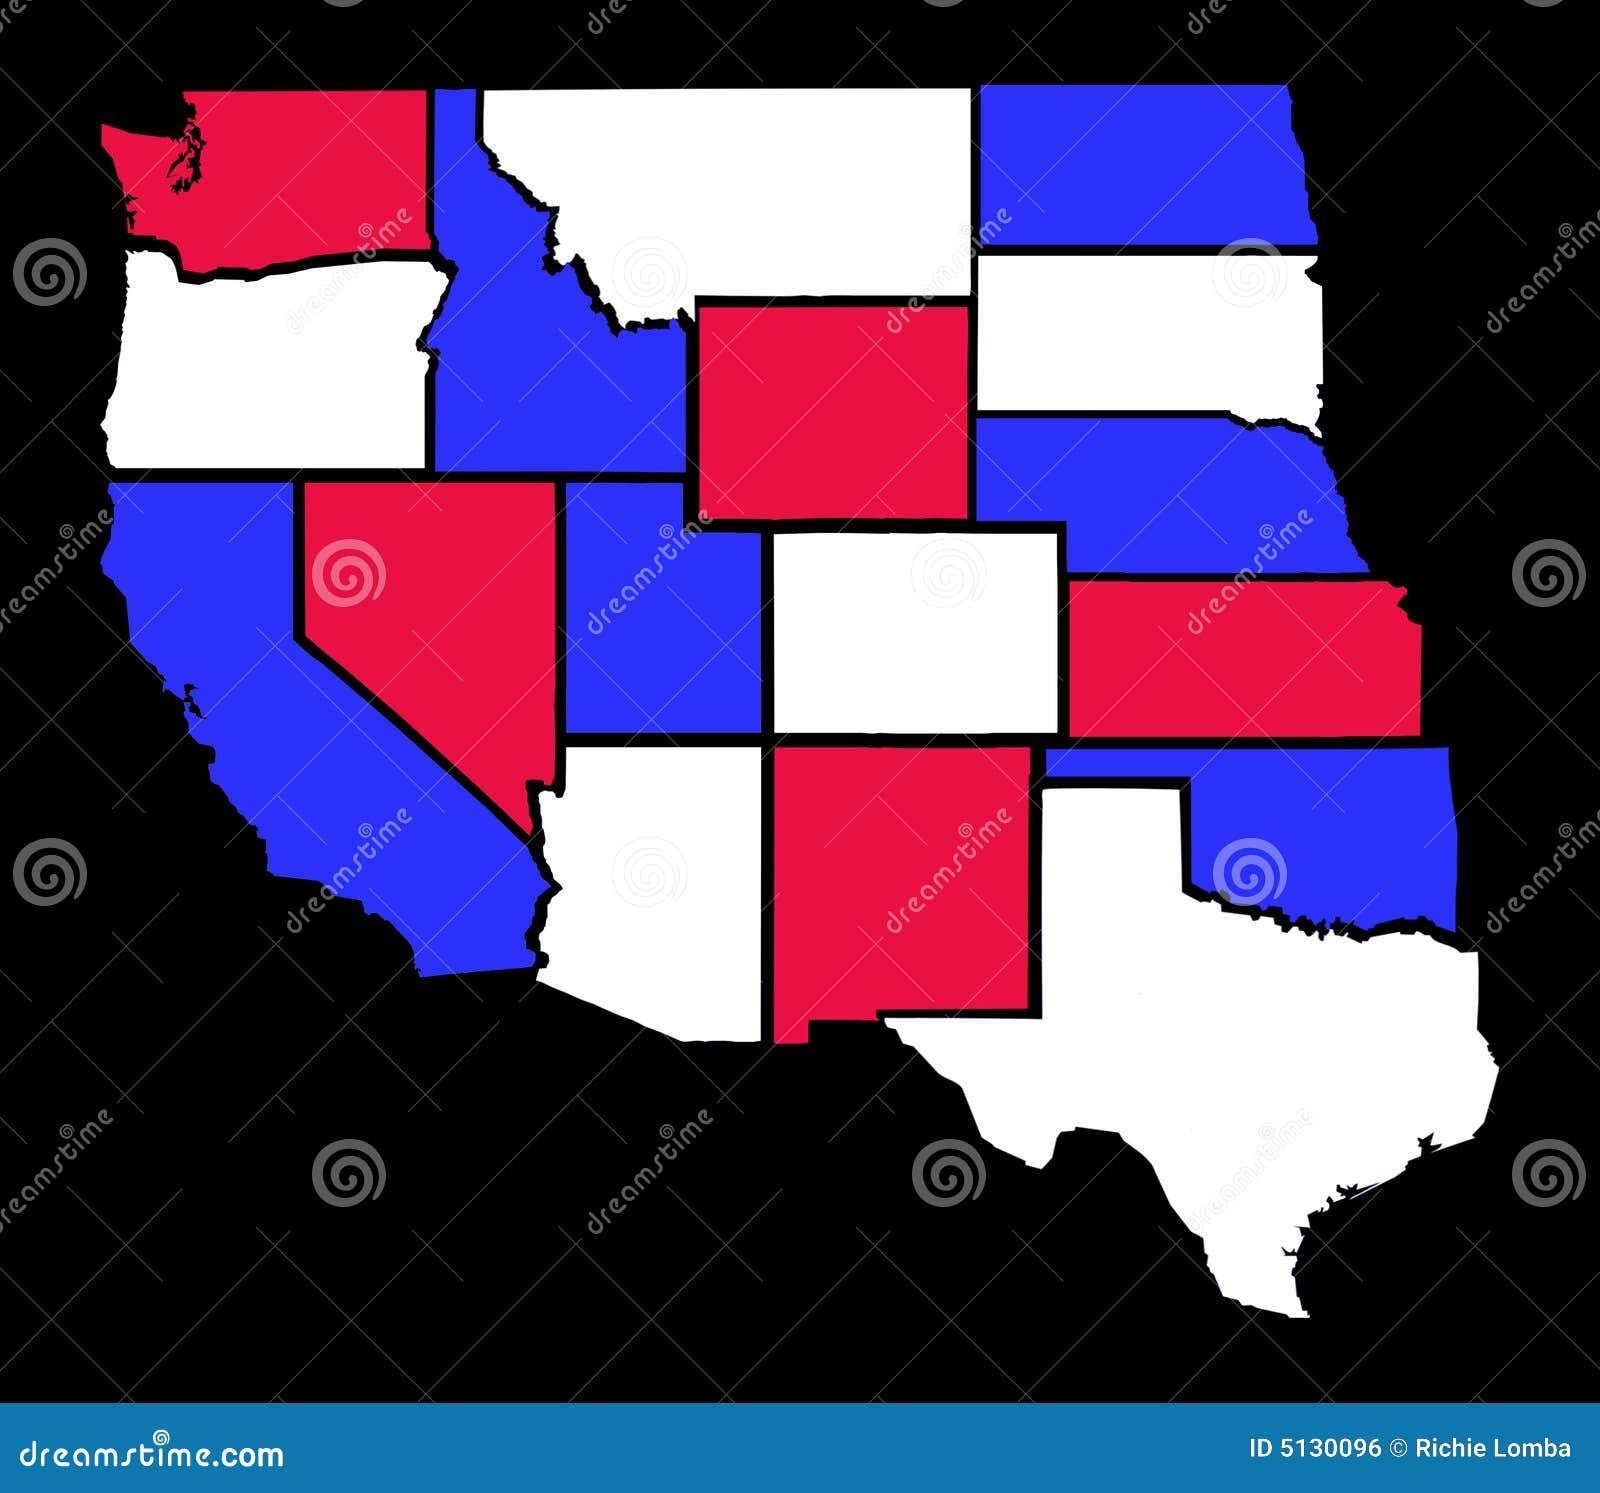 United States Map Royalty Free Stock Image Image - Free united states map graphic